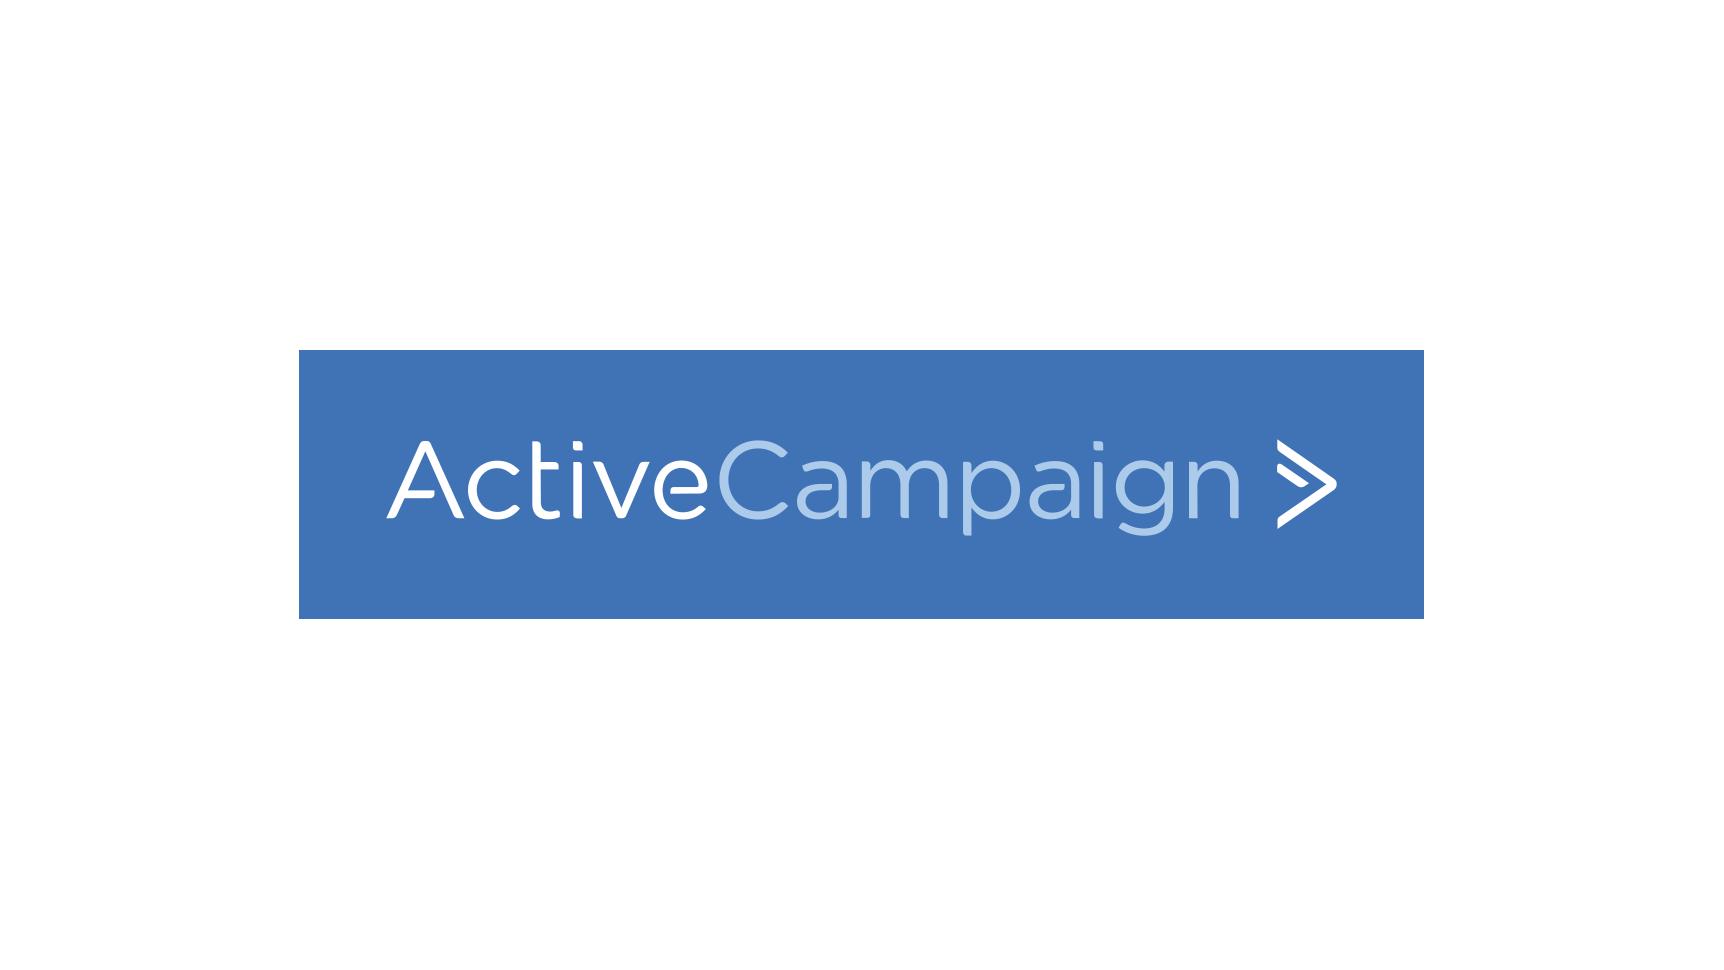 ActiveCampaign.